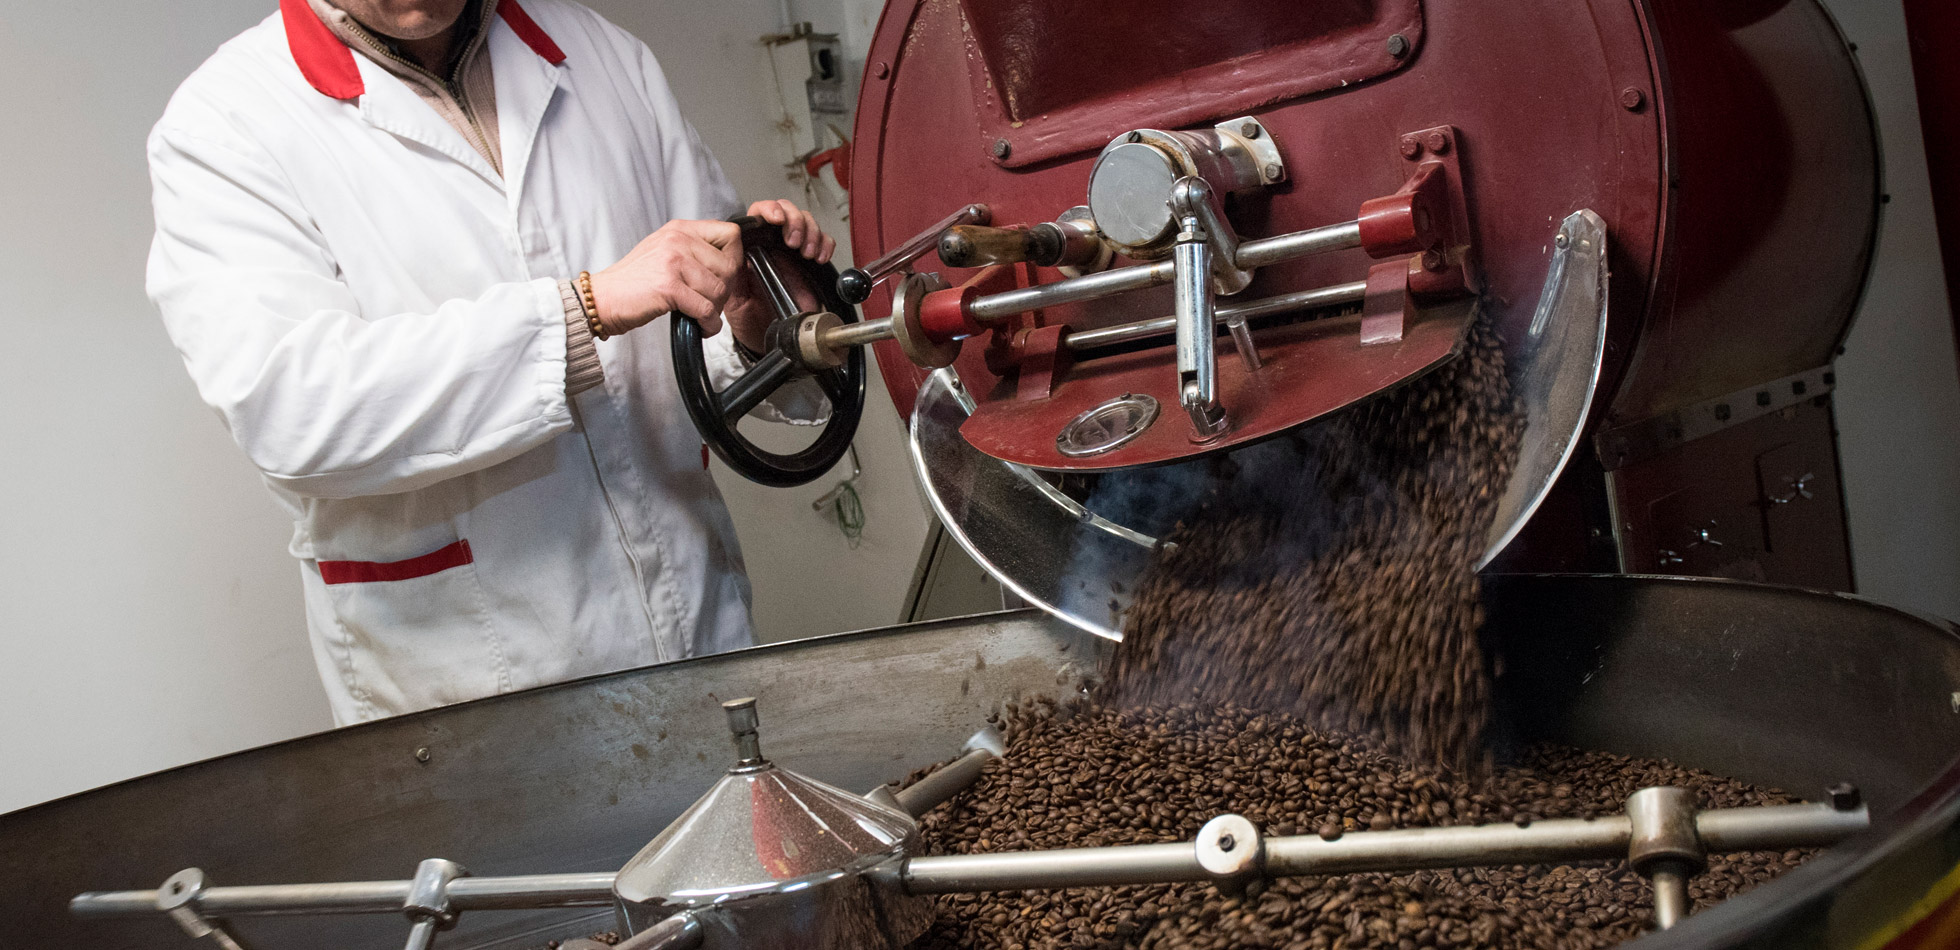 Micro Torrefazione Artigianale Effe Caffè